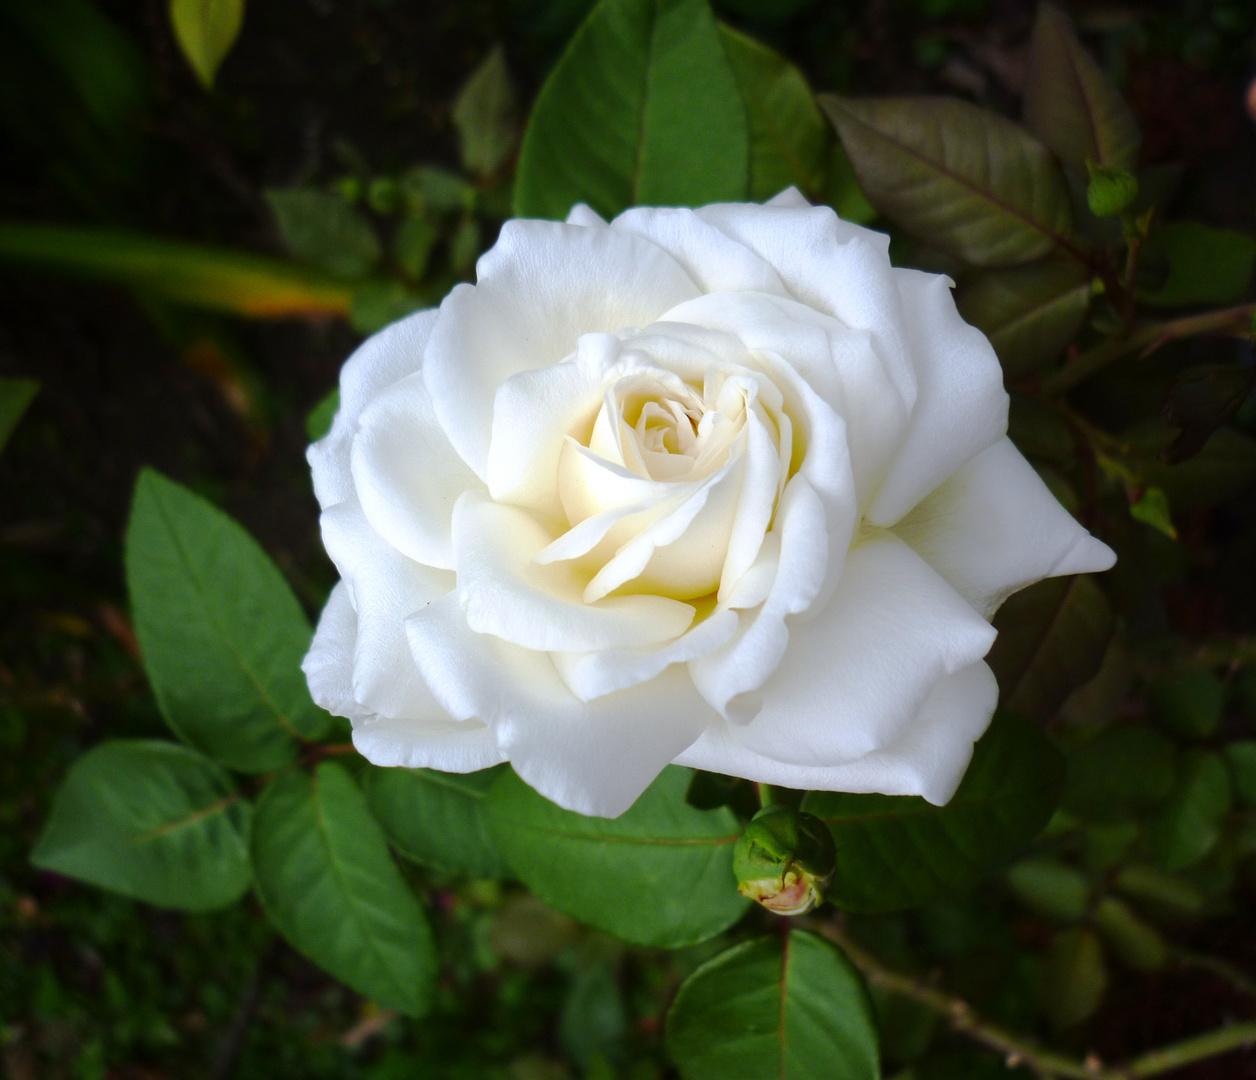 una bella rosa blanca imagen foto plantas flores naturaleza fotos de fotocommunity. Black Bedroom Furniture Sets. Home Design Ideas